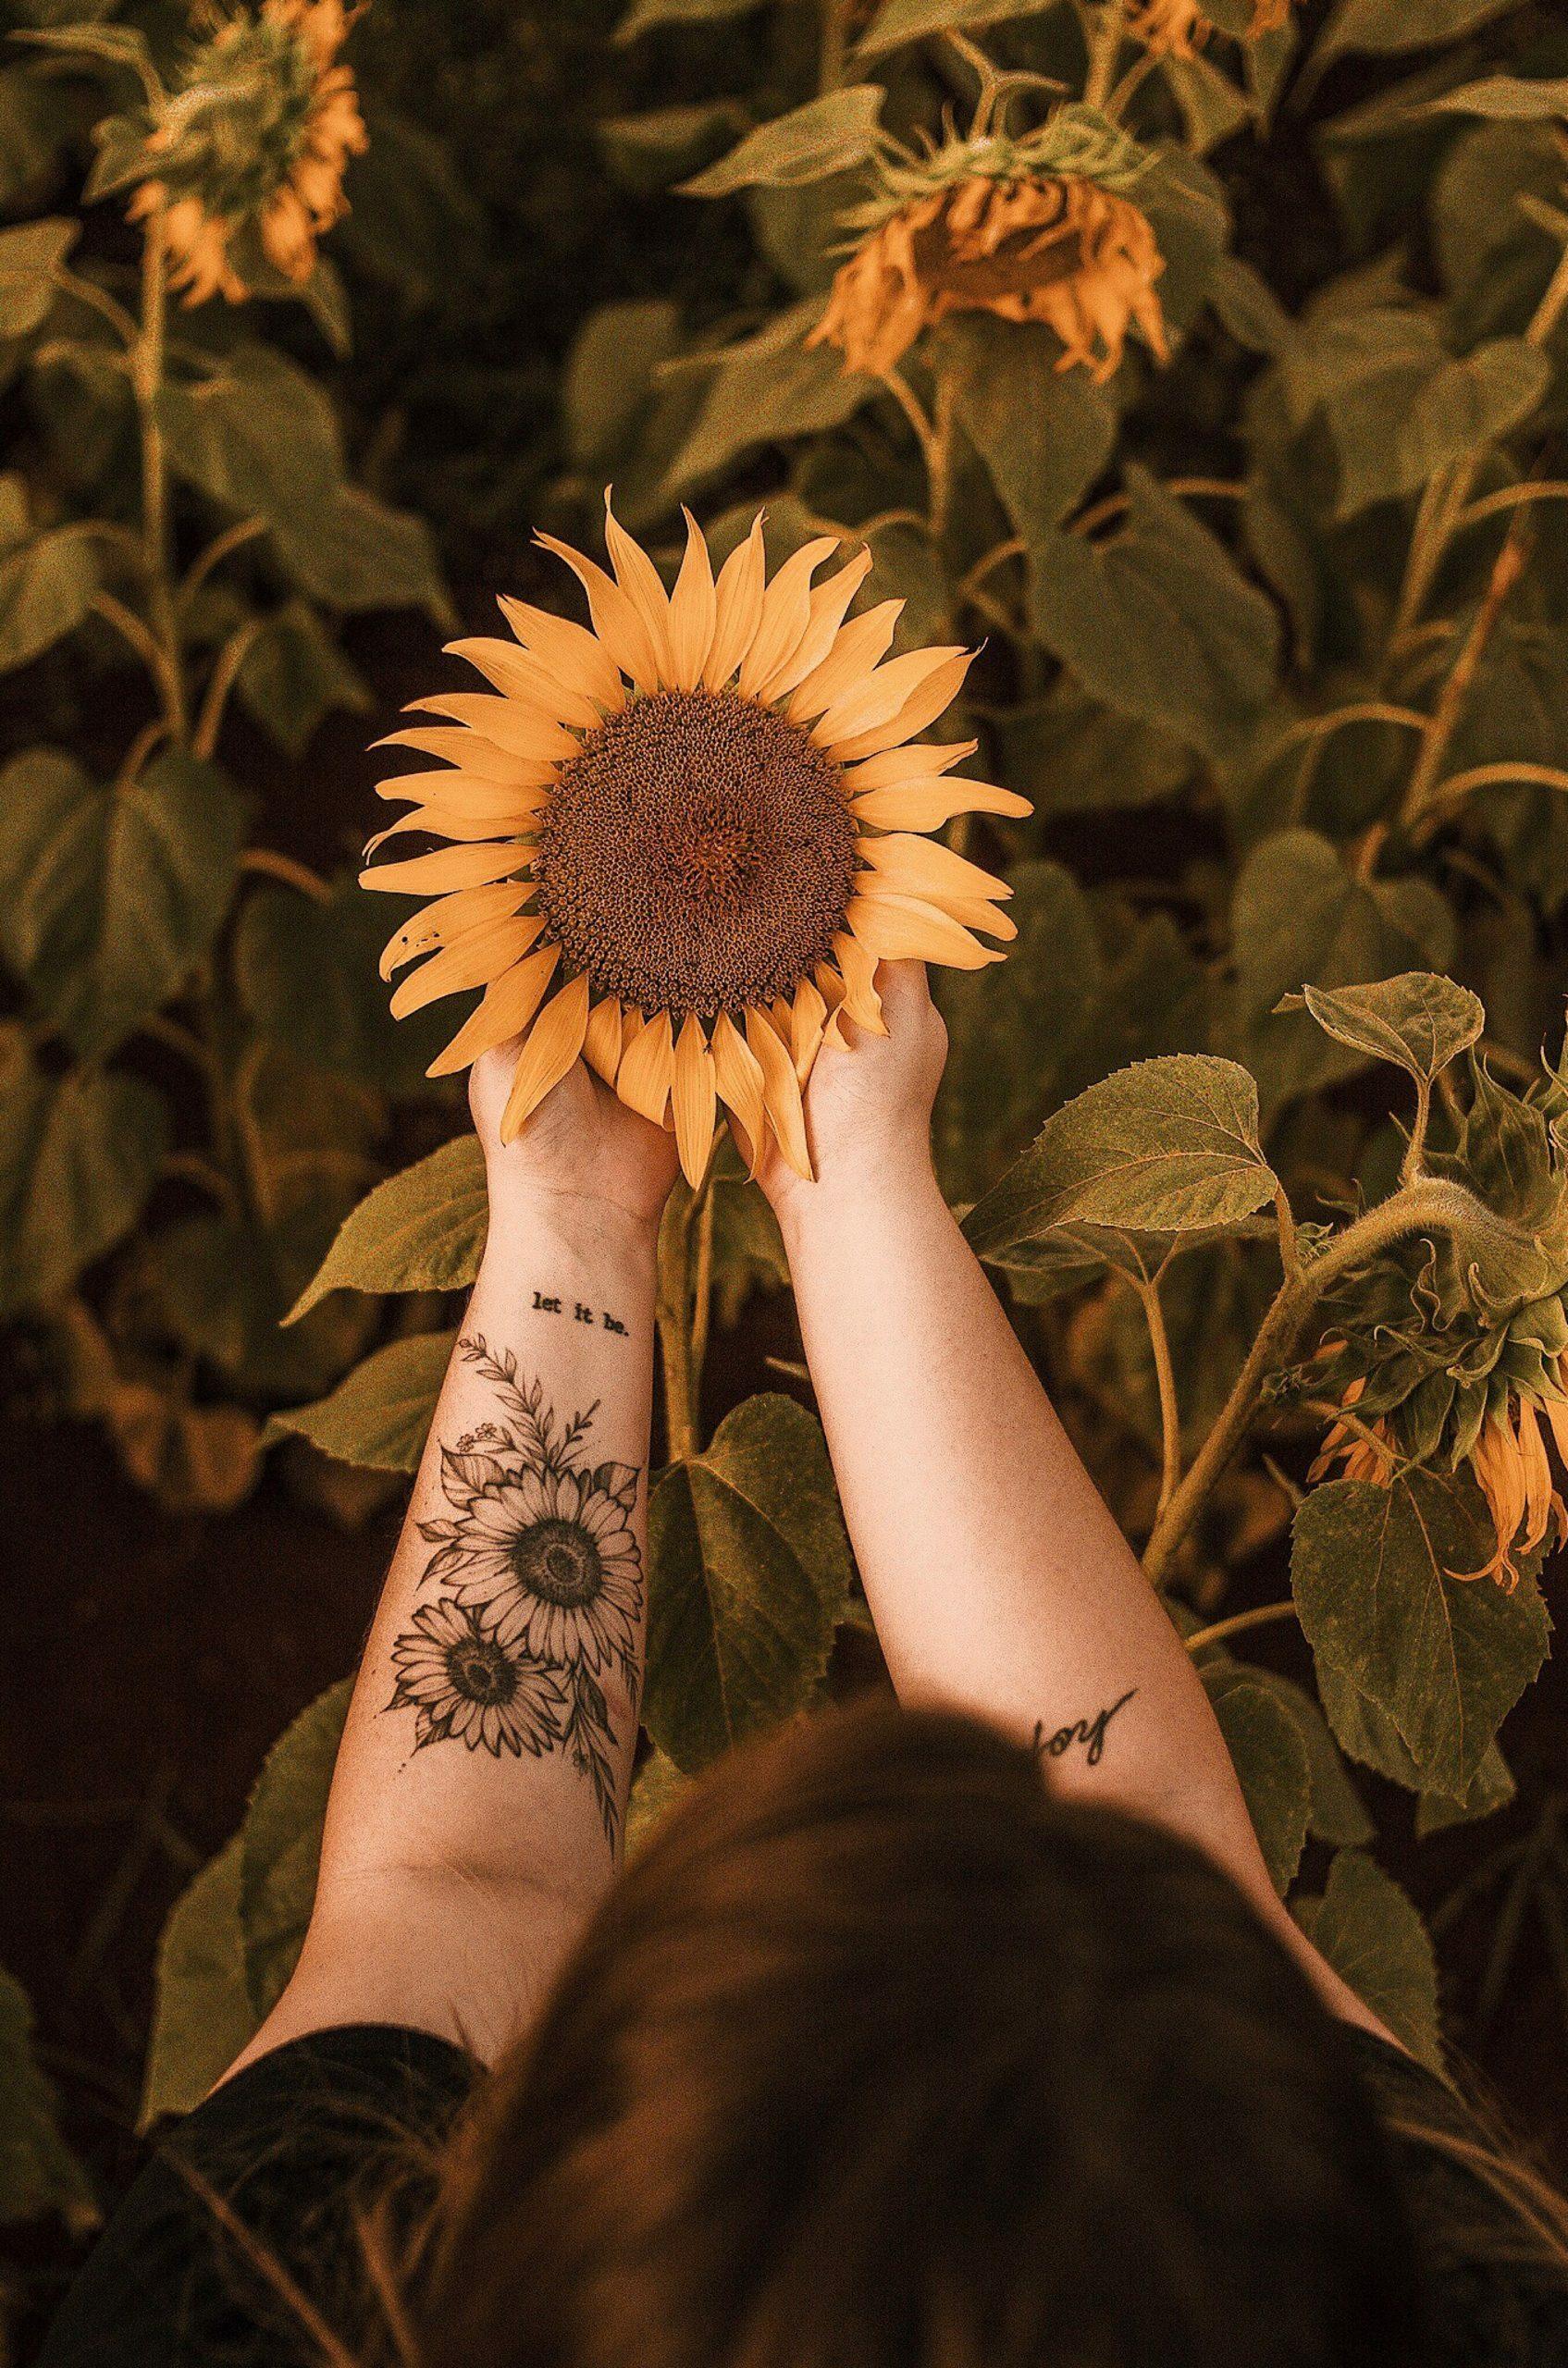 personal growth tattoo photo